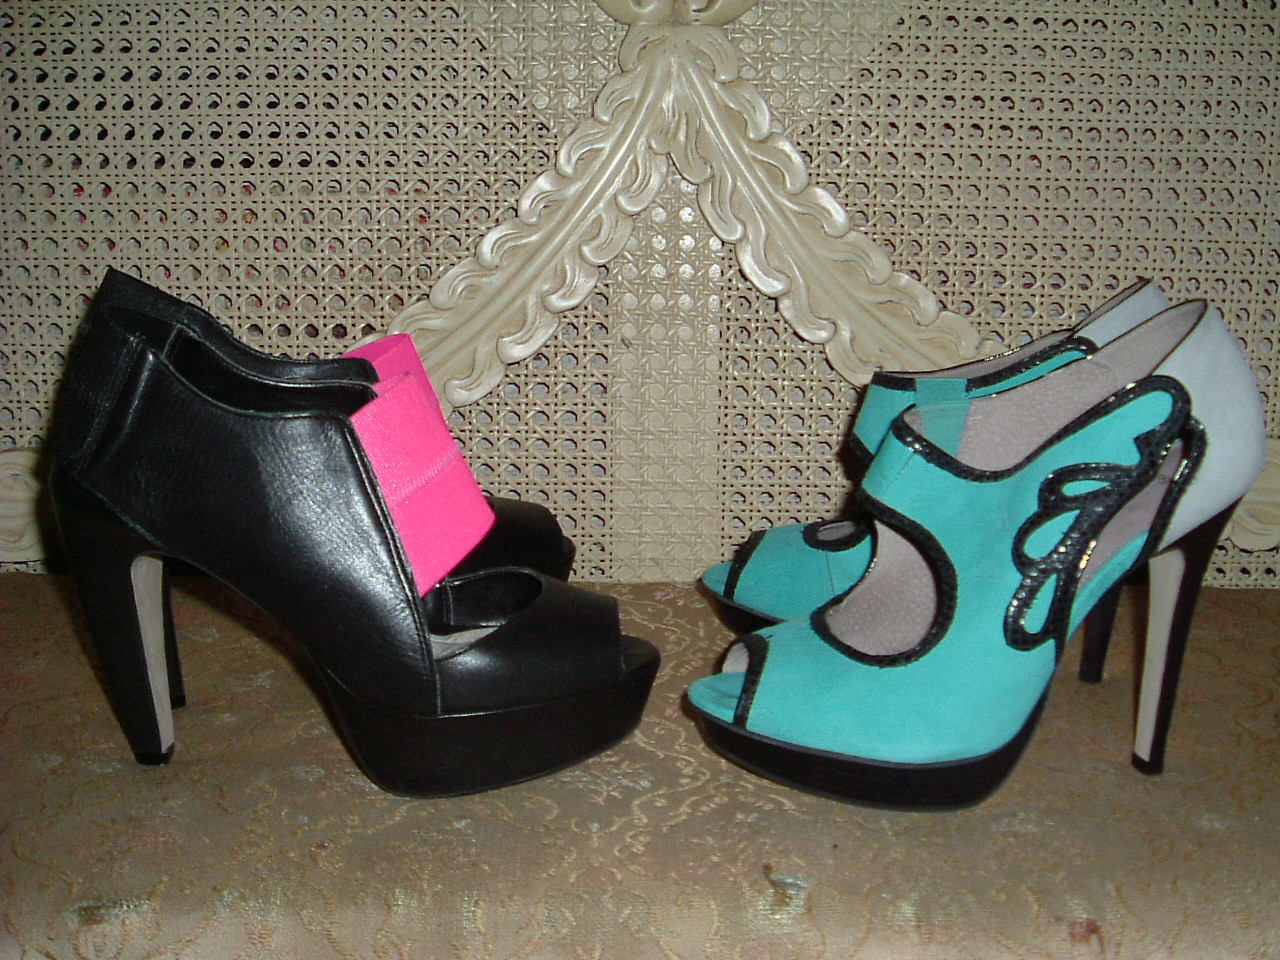 Orthopedic Shoe Store For Men Punta Gorda Fl